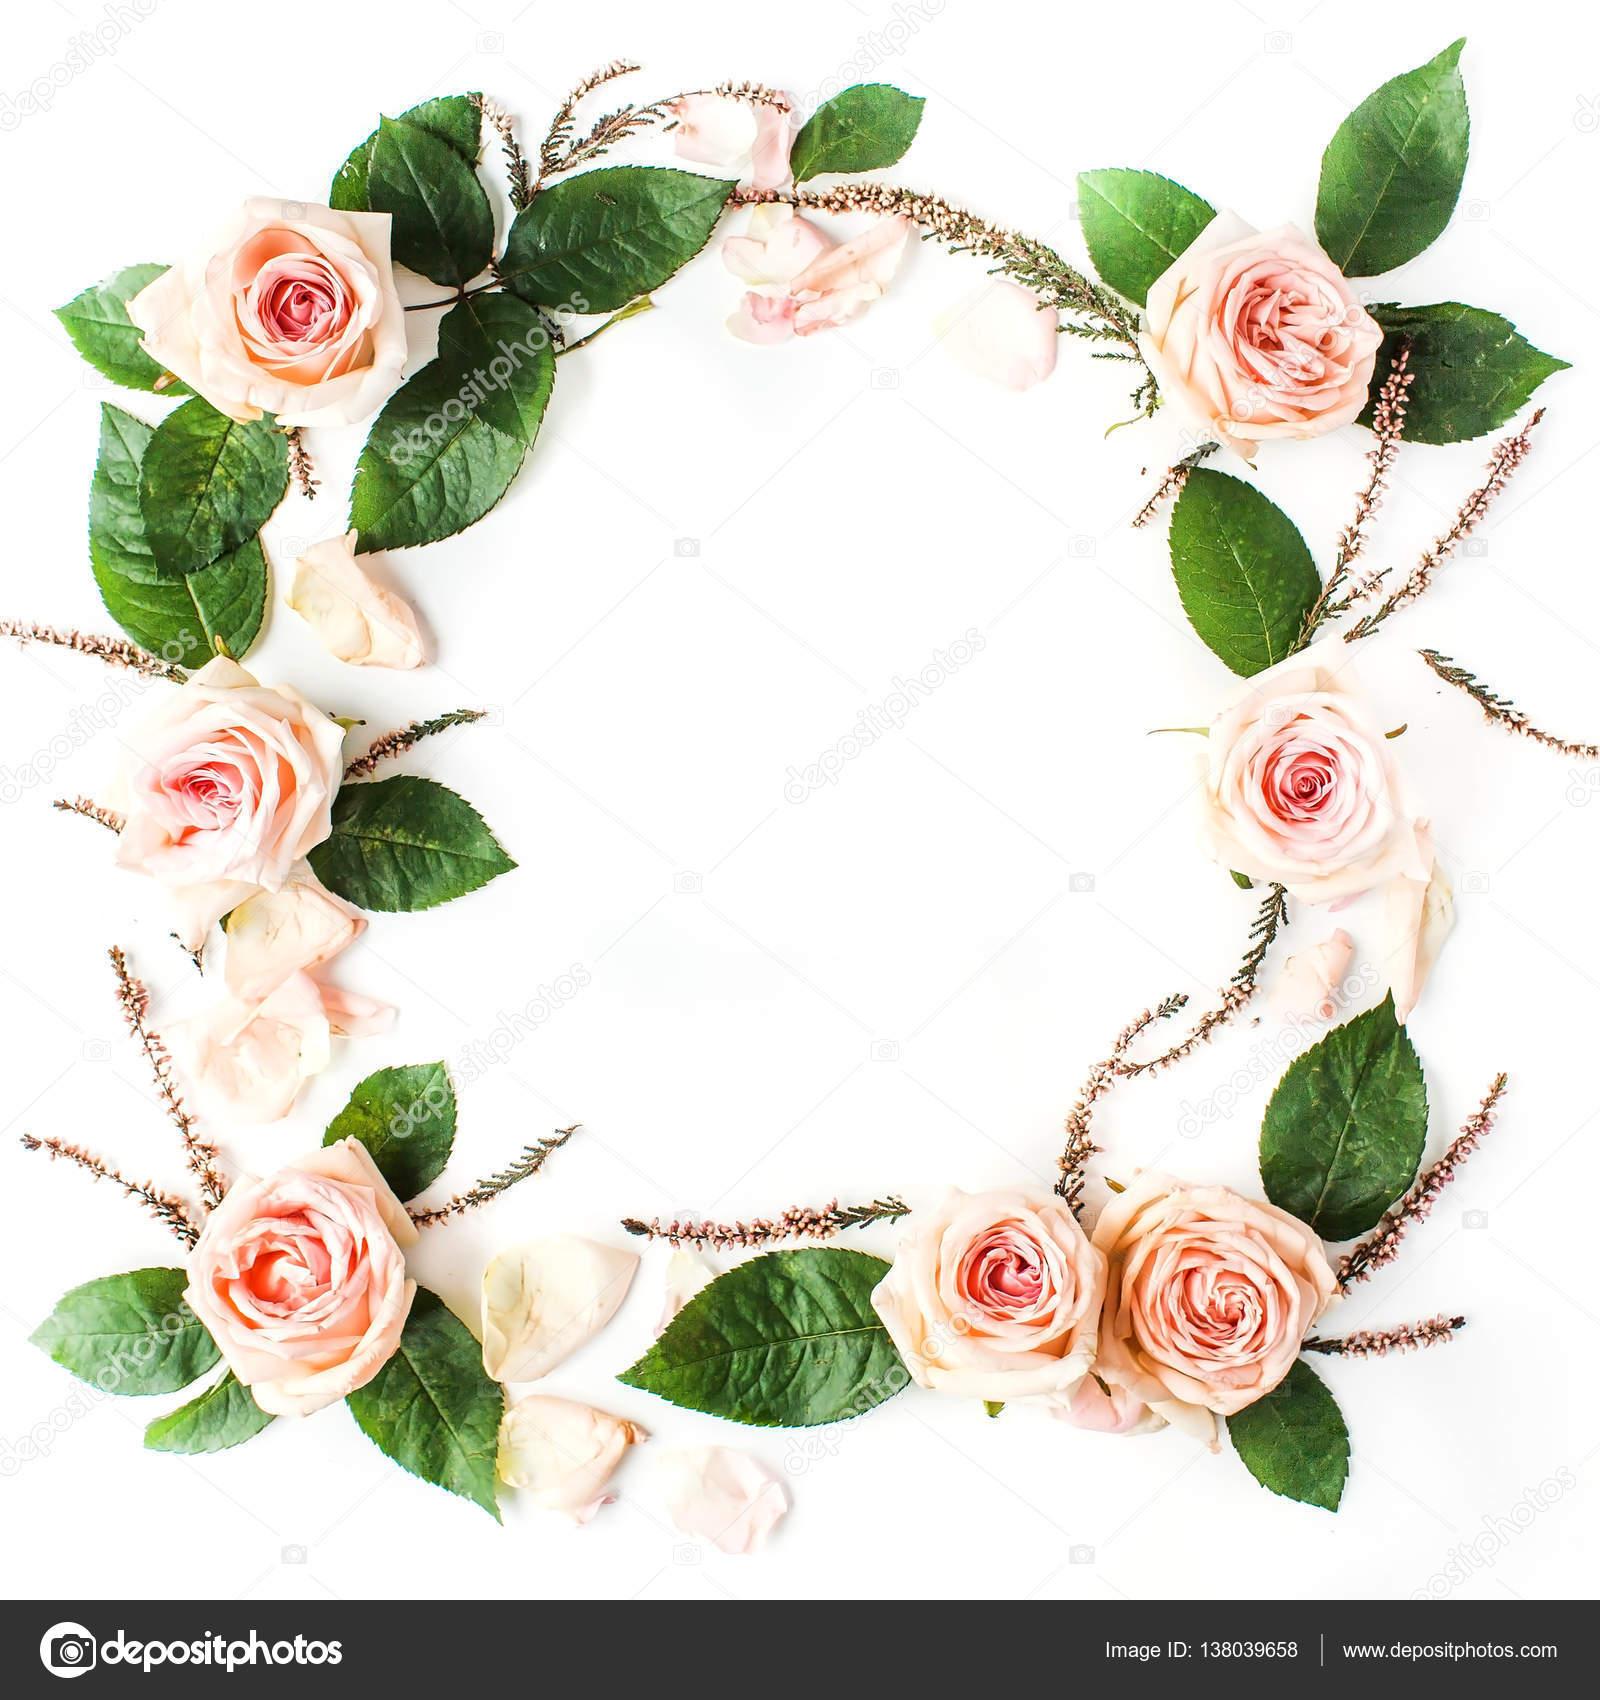 Rahmen aus rosa Rosen — Stockfoto © maximleshkovich #138039658